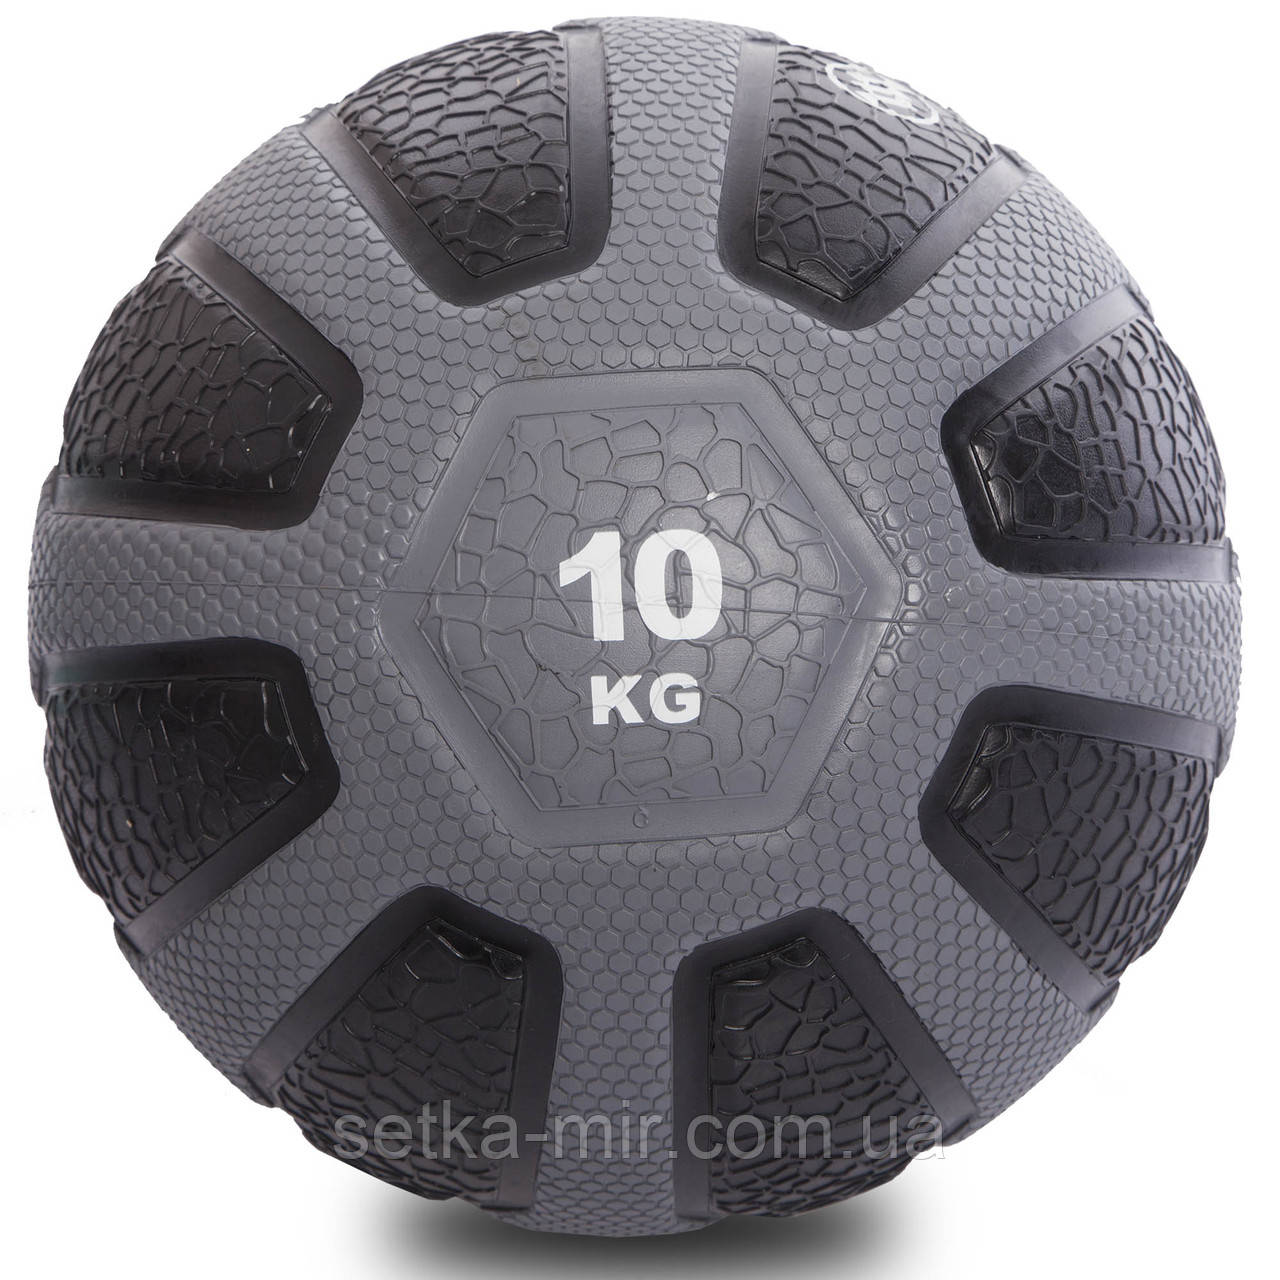 Мяч медицинский медбол Zelart Medicine Ball FI-0898-10 10кг